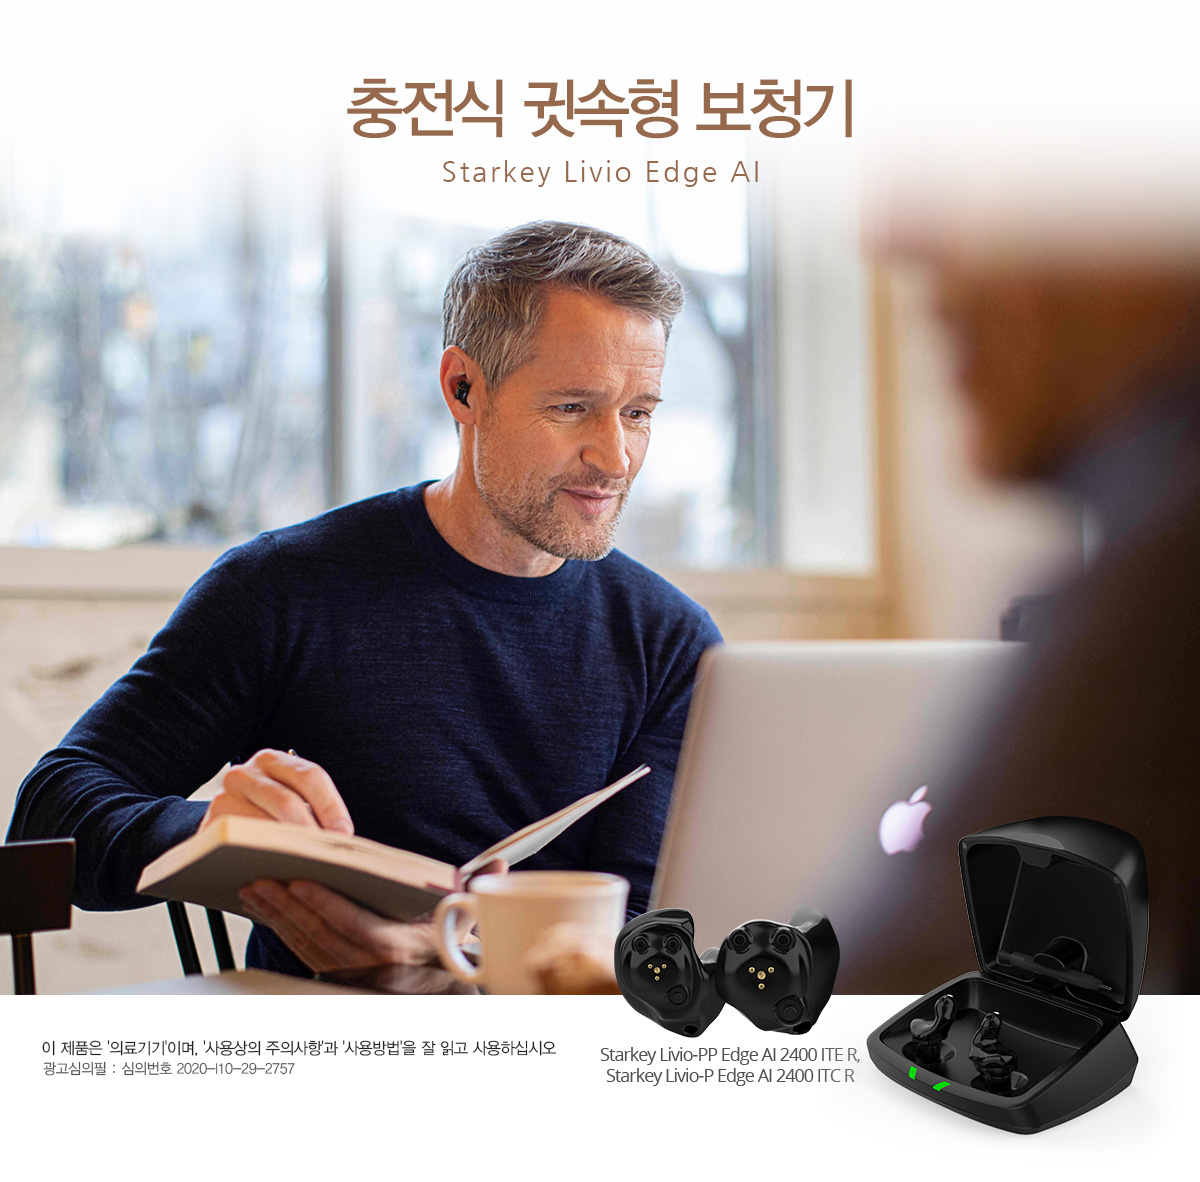 Starkey Livio-PP Edge AI 2400 ITE R, Starkey Livio-P Edge AI 2400 ITC R 이 제품은 '의료기기'이며, '사용상의 주의사항'과 '사용방법'을 잘 읽고 사용하십시오 광고심의필 : 심의번호 2020-I10-29-2757